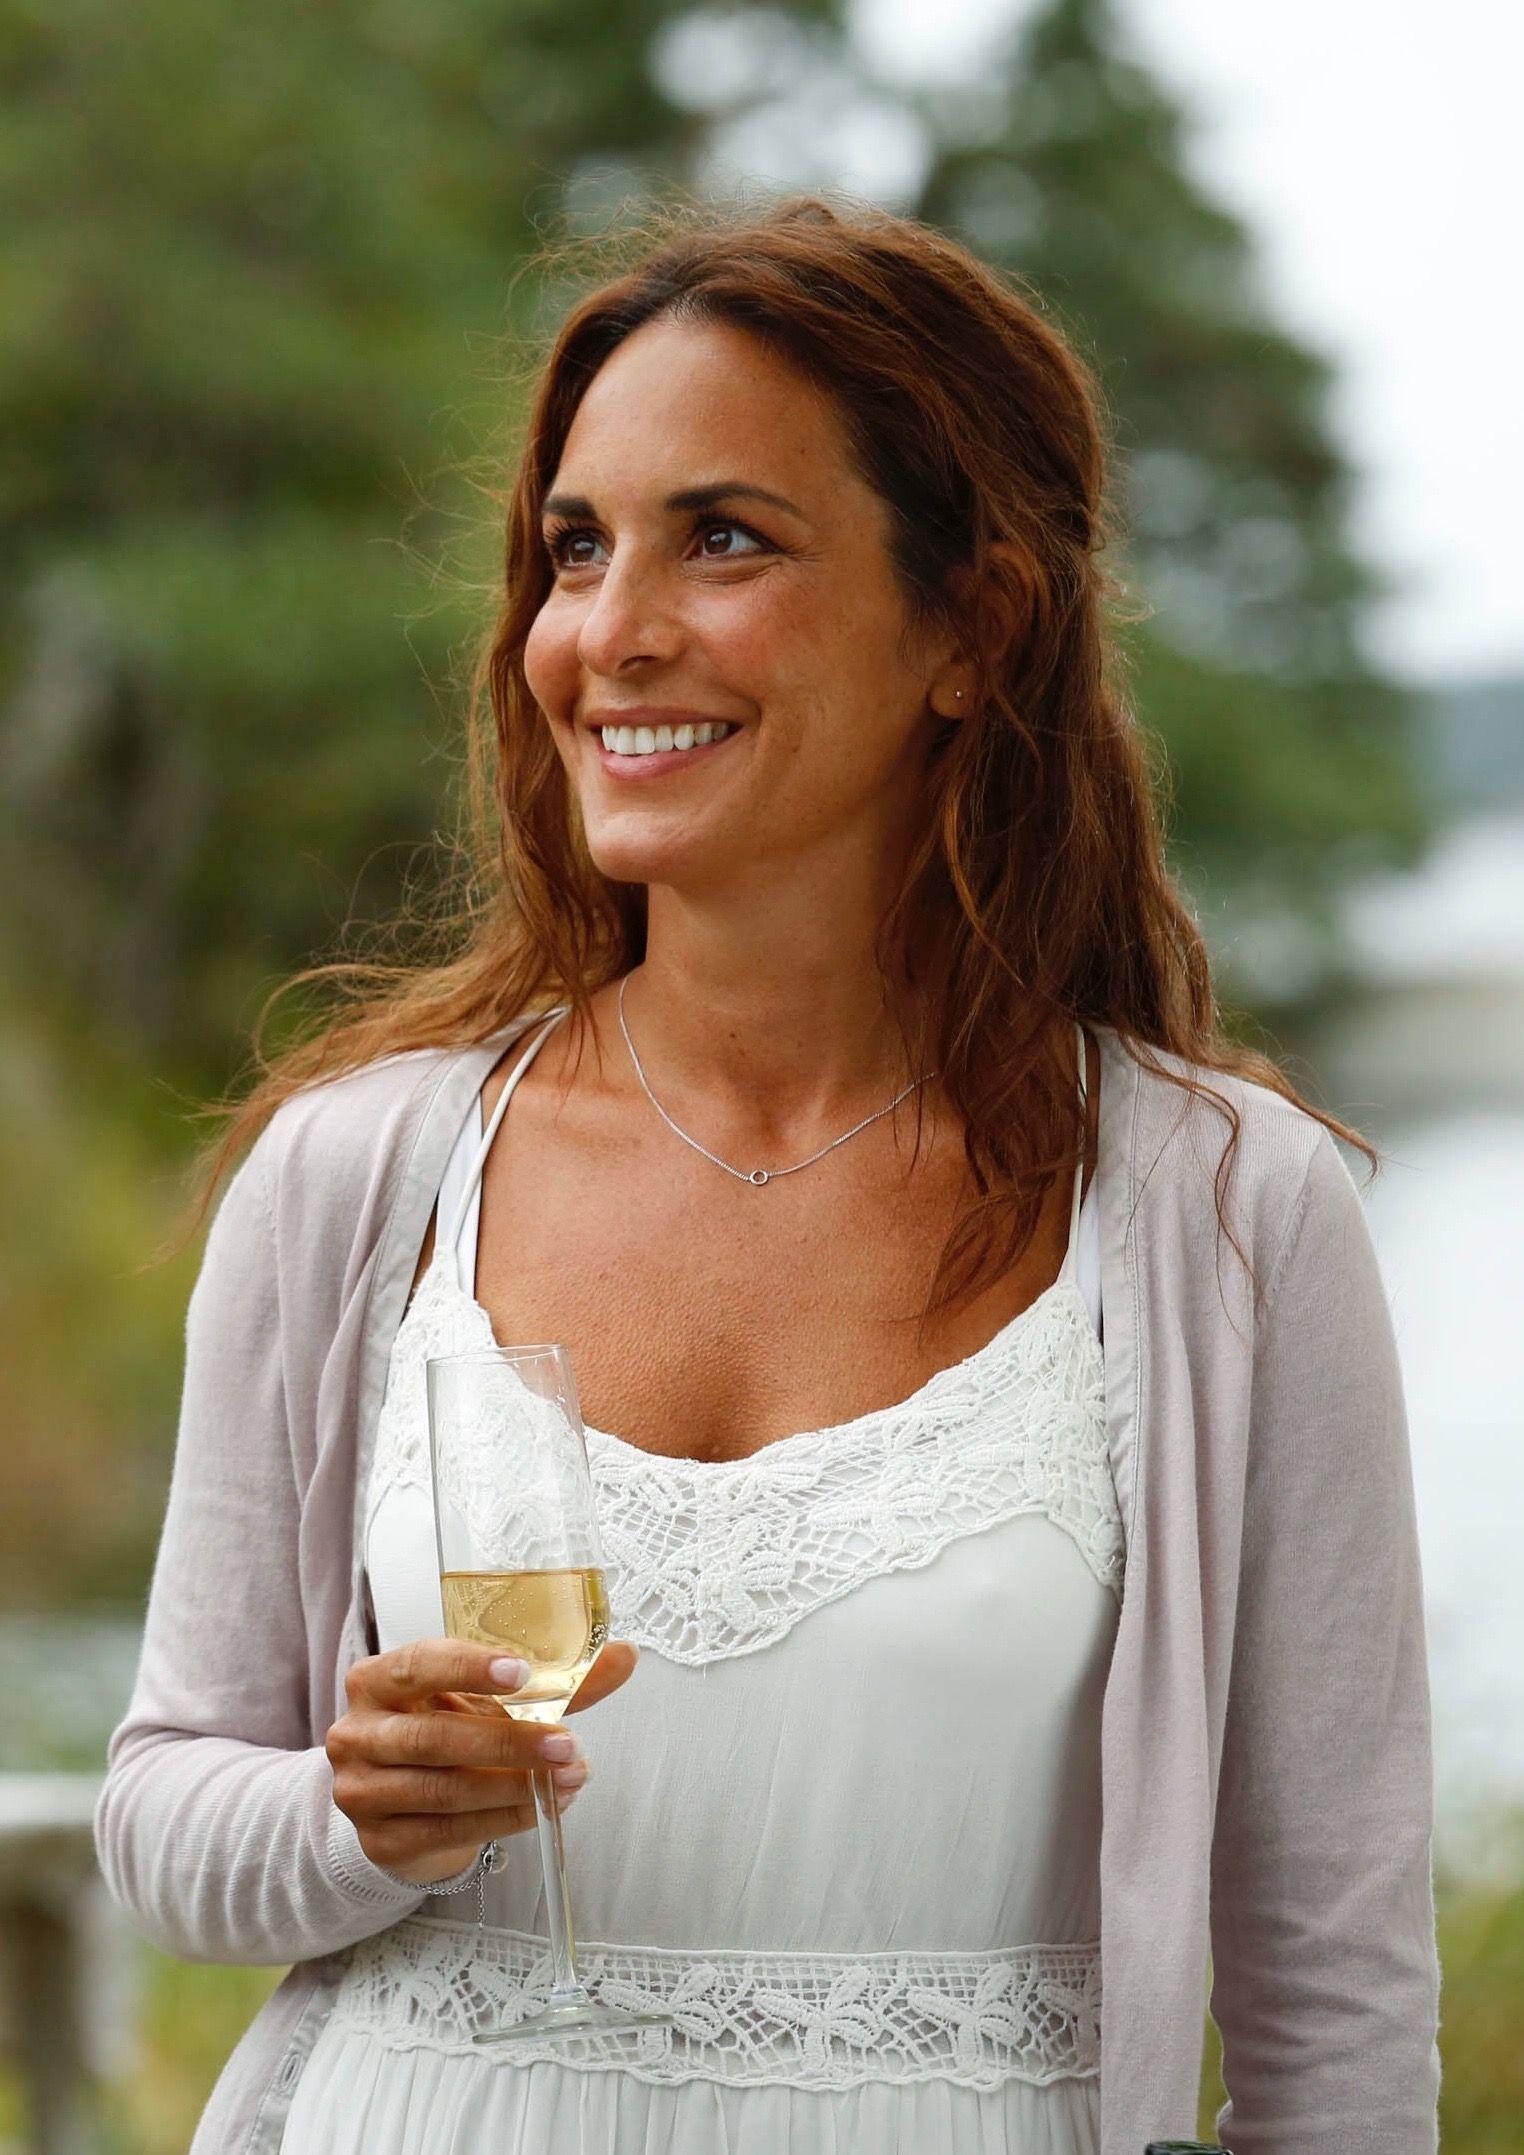 Alexandra Rapaport She is married to joakim eliasson. The